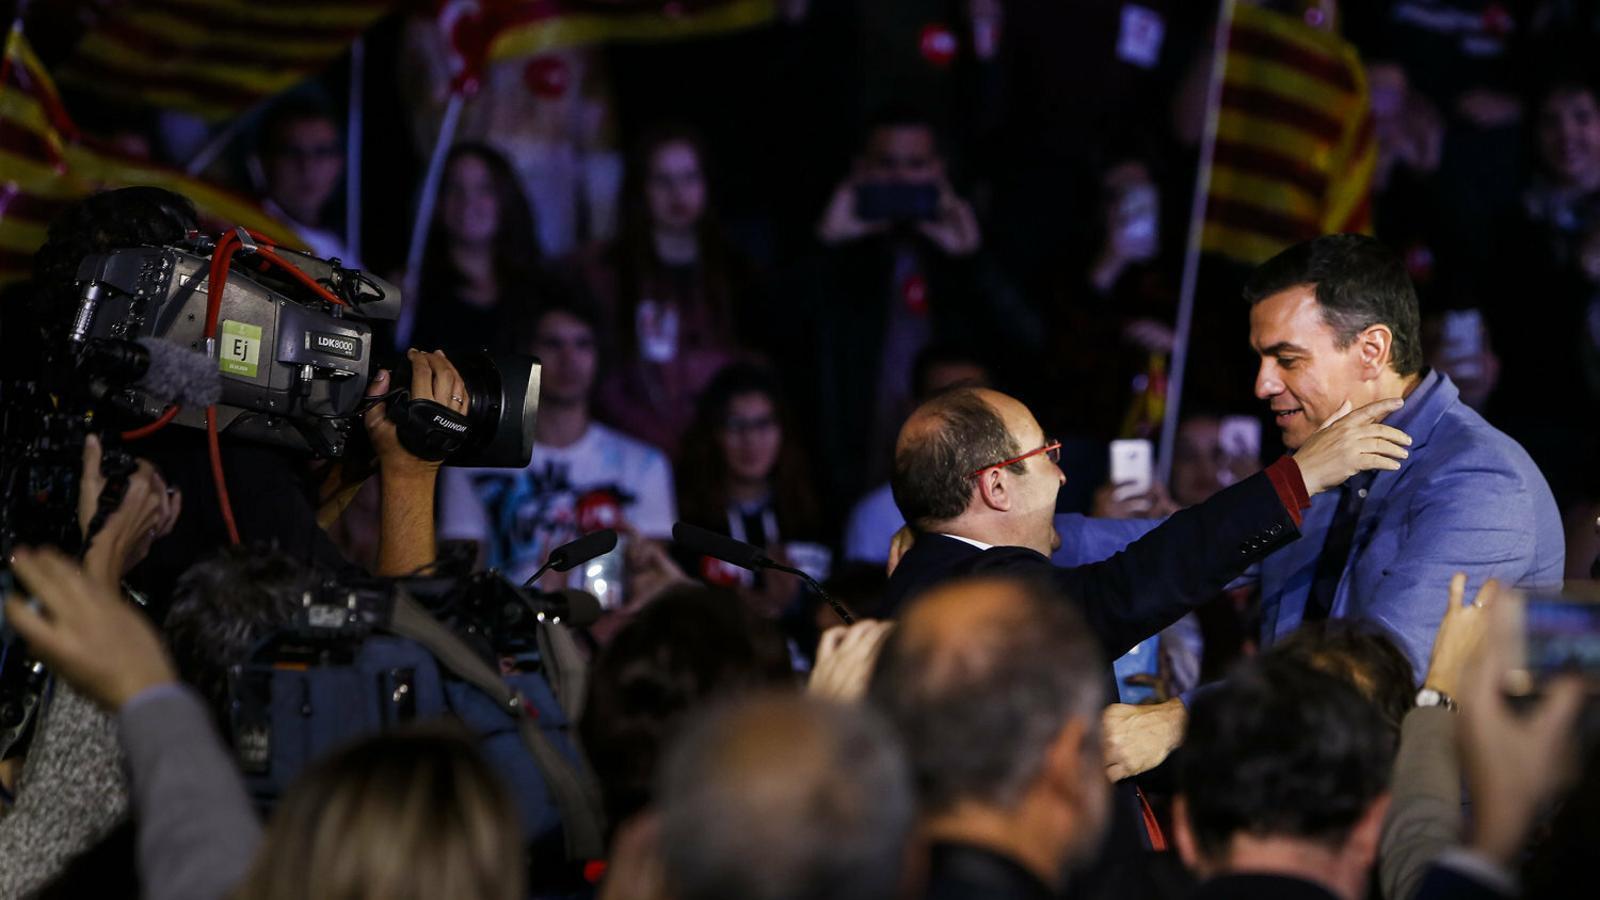 Partit socialista Pedro Sánchez